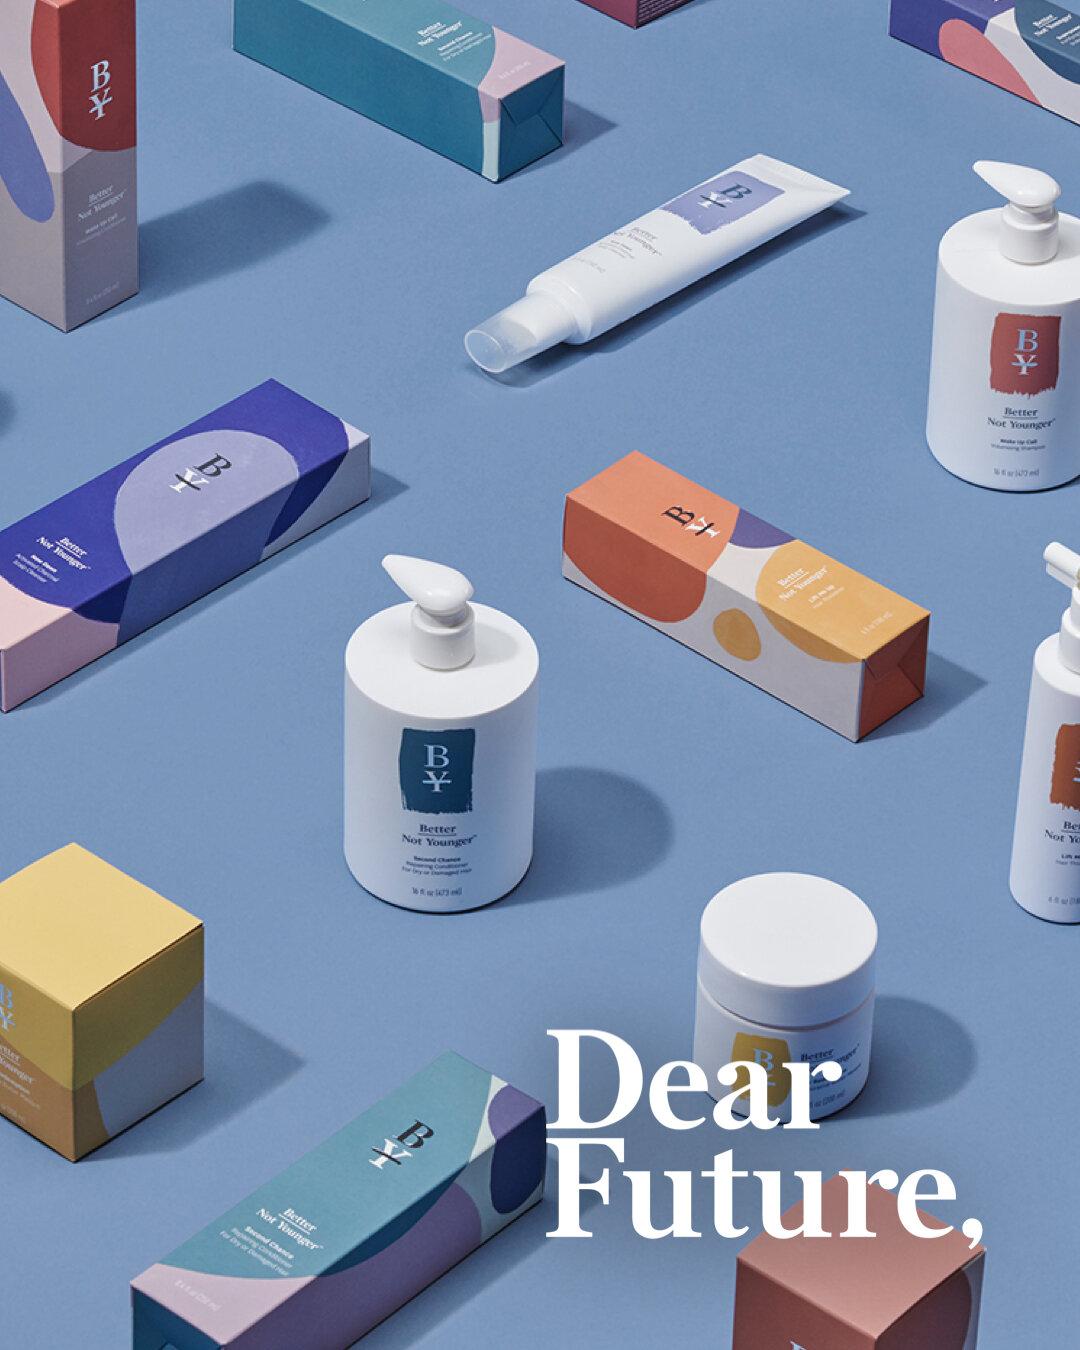 DearFuture_West 2019 - Headshots.001.jpeg